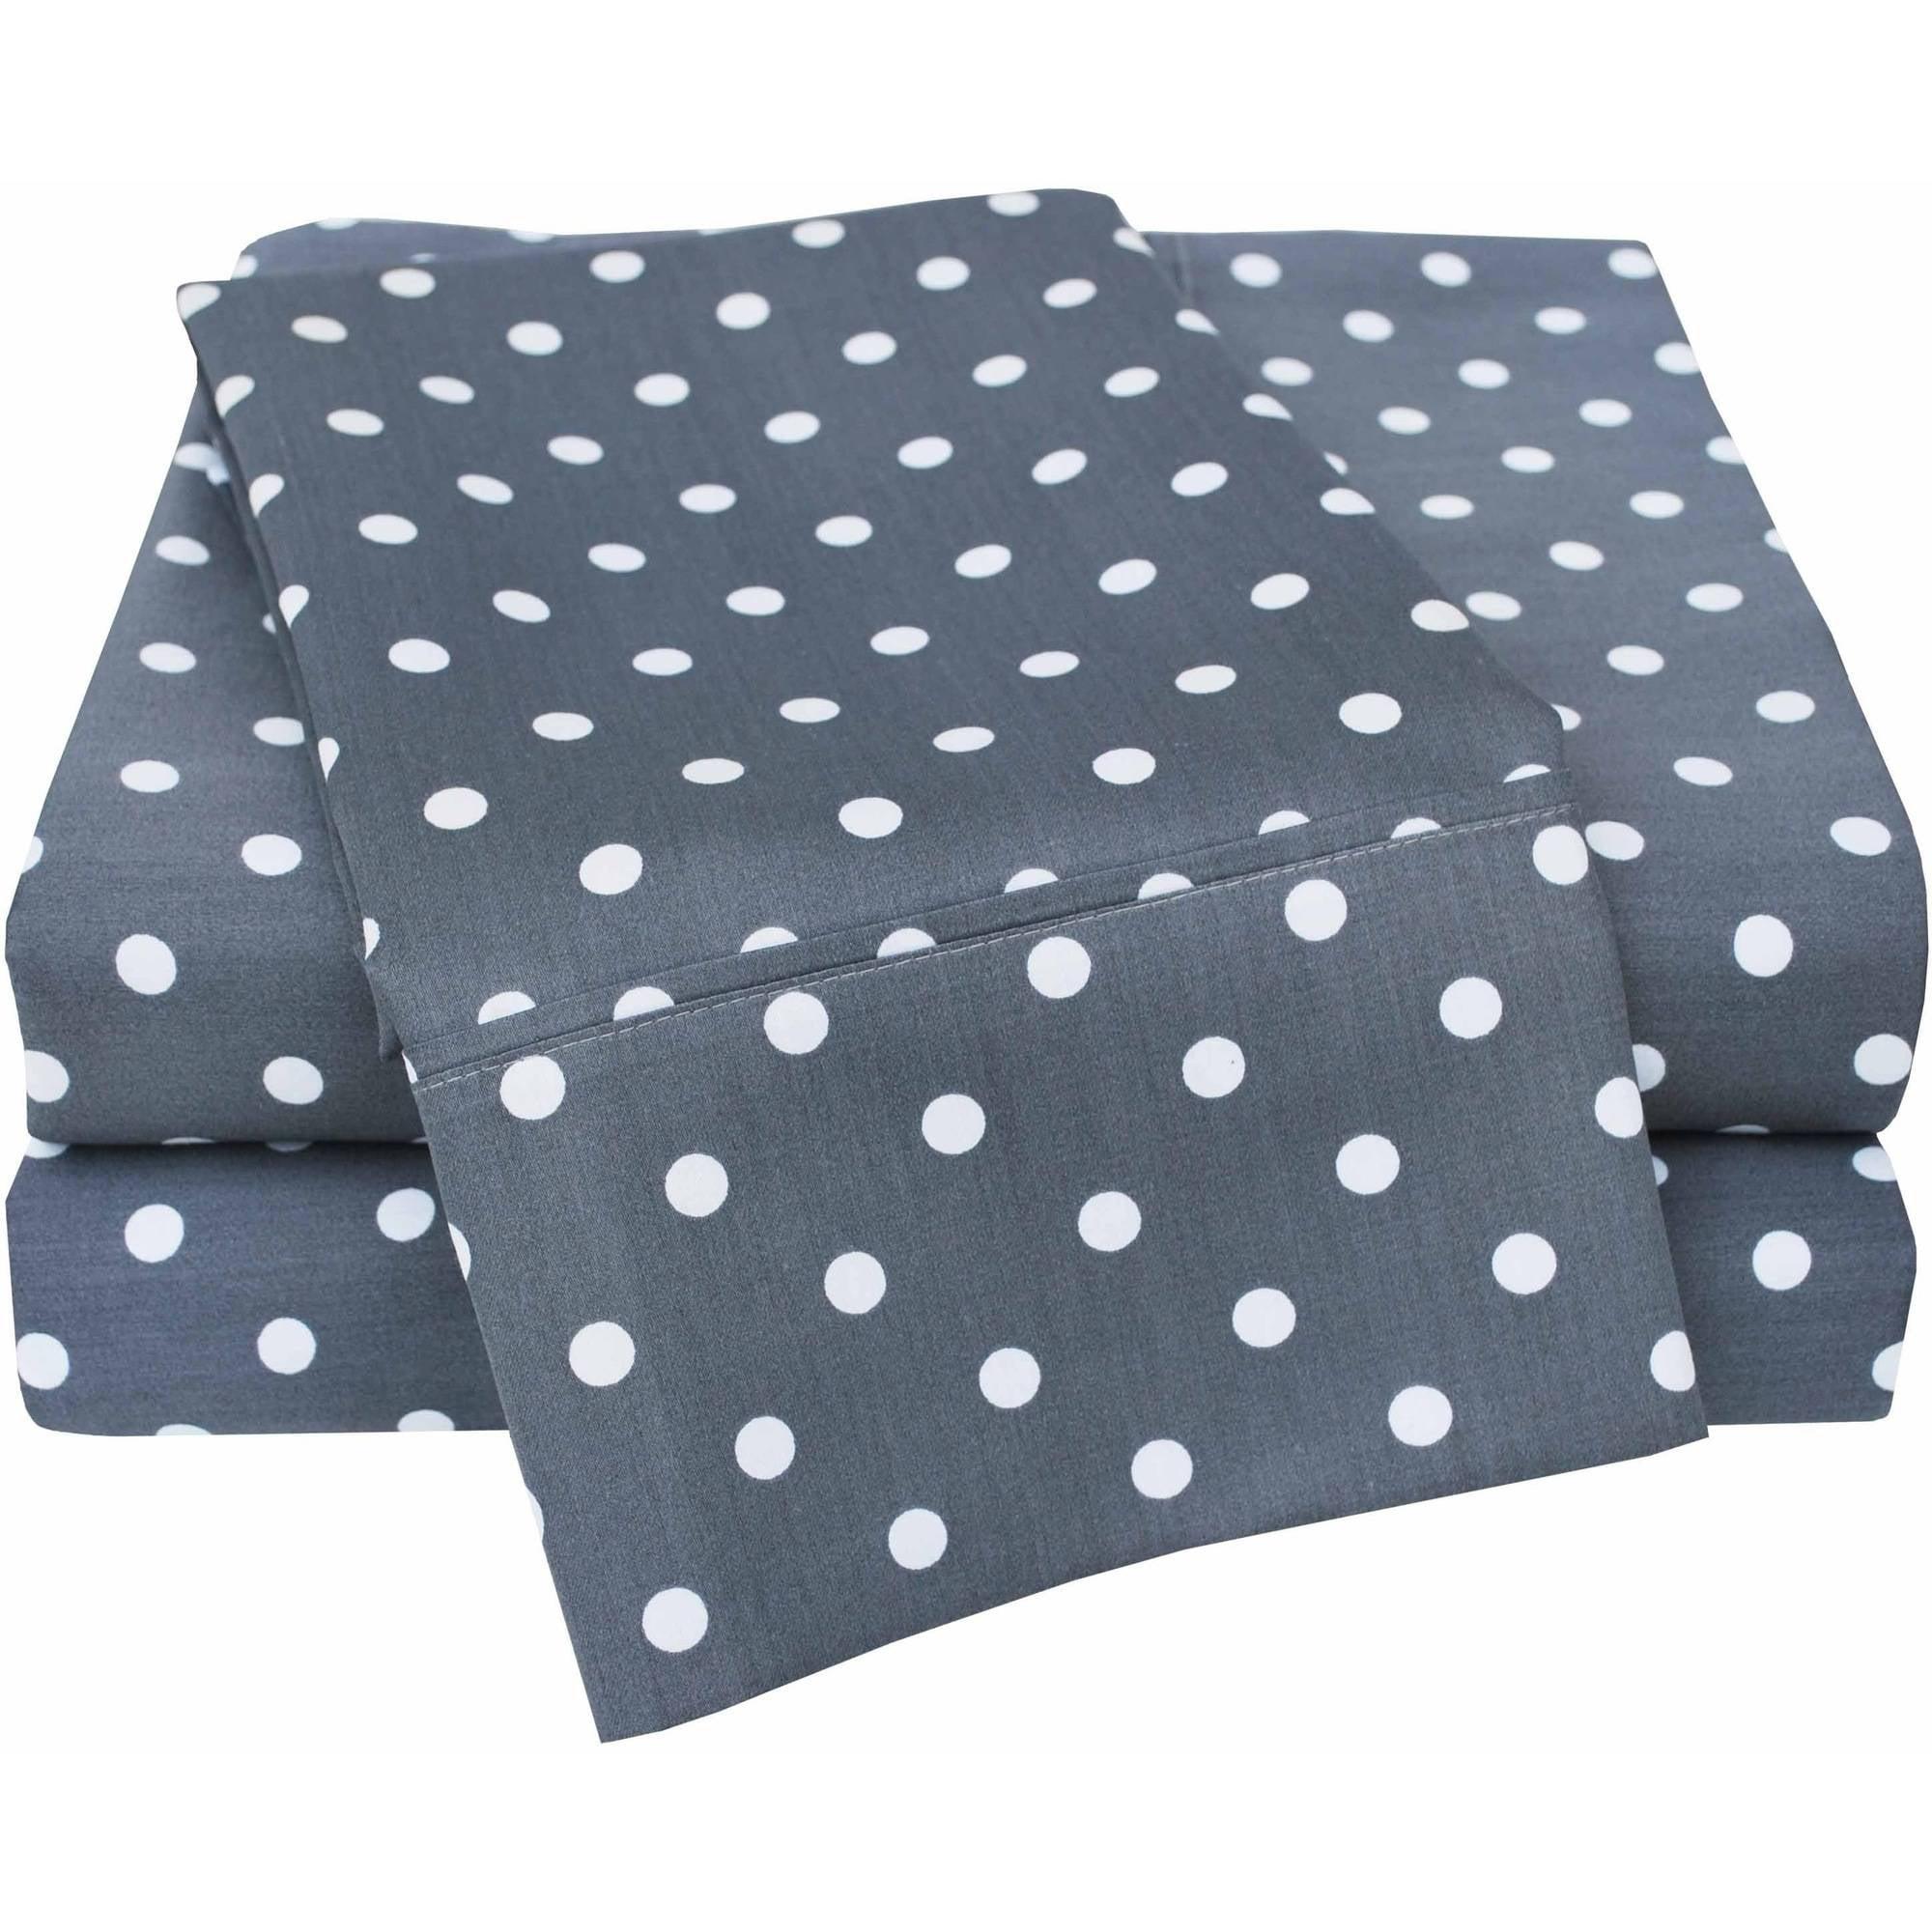 superior 600 thread count luxury cotton polka dots design sheet set walmartcom